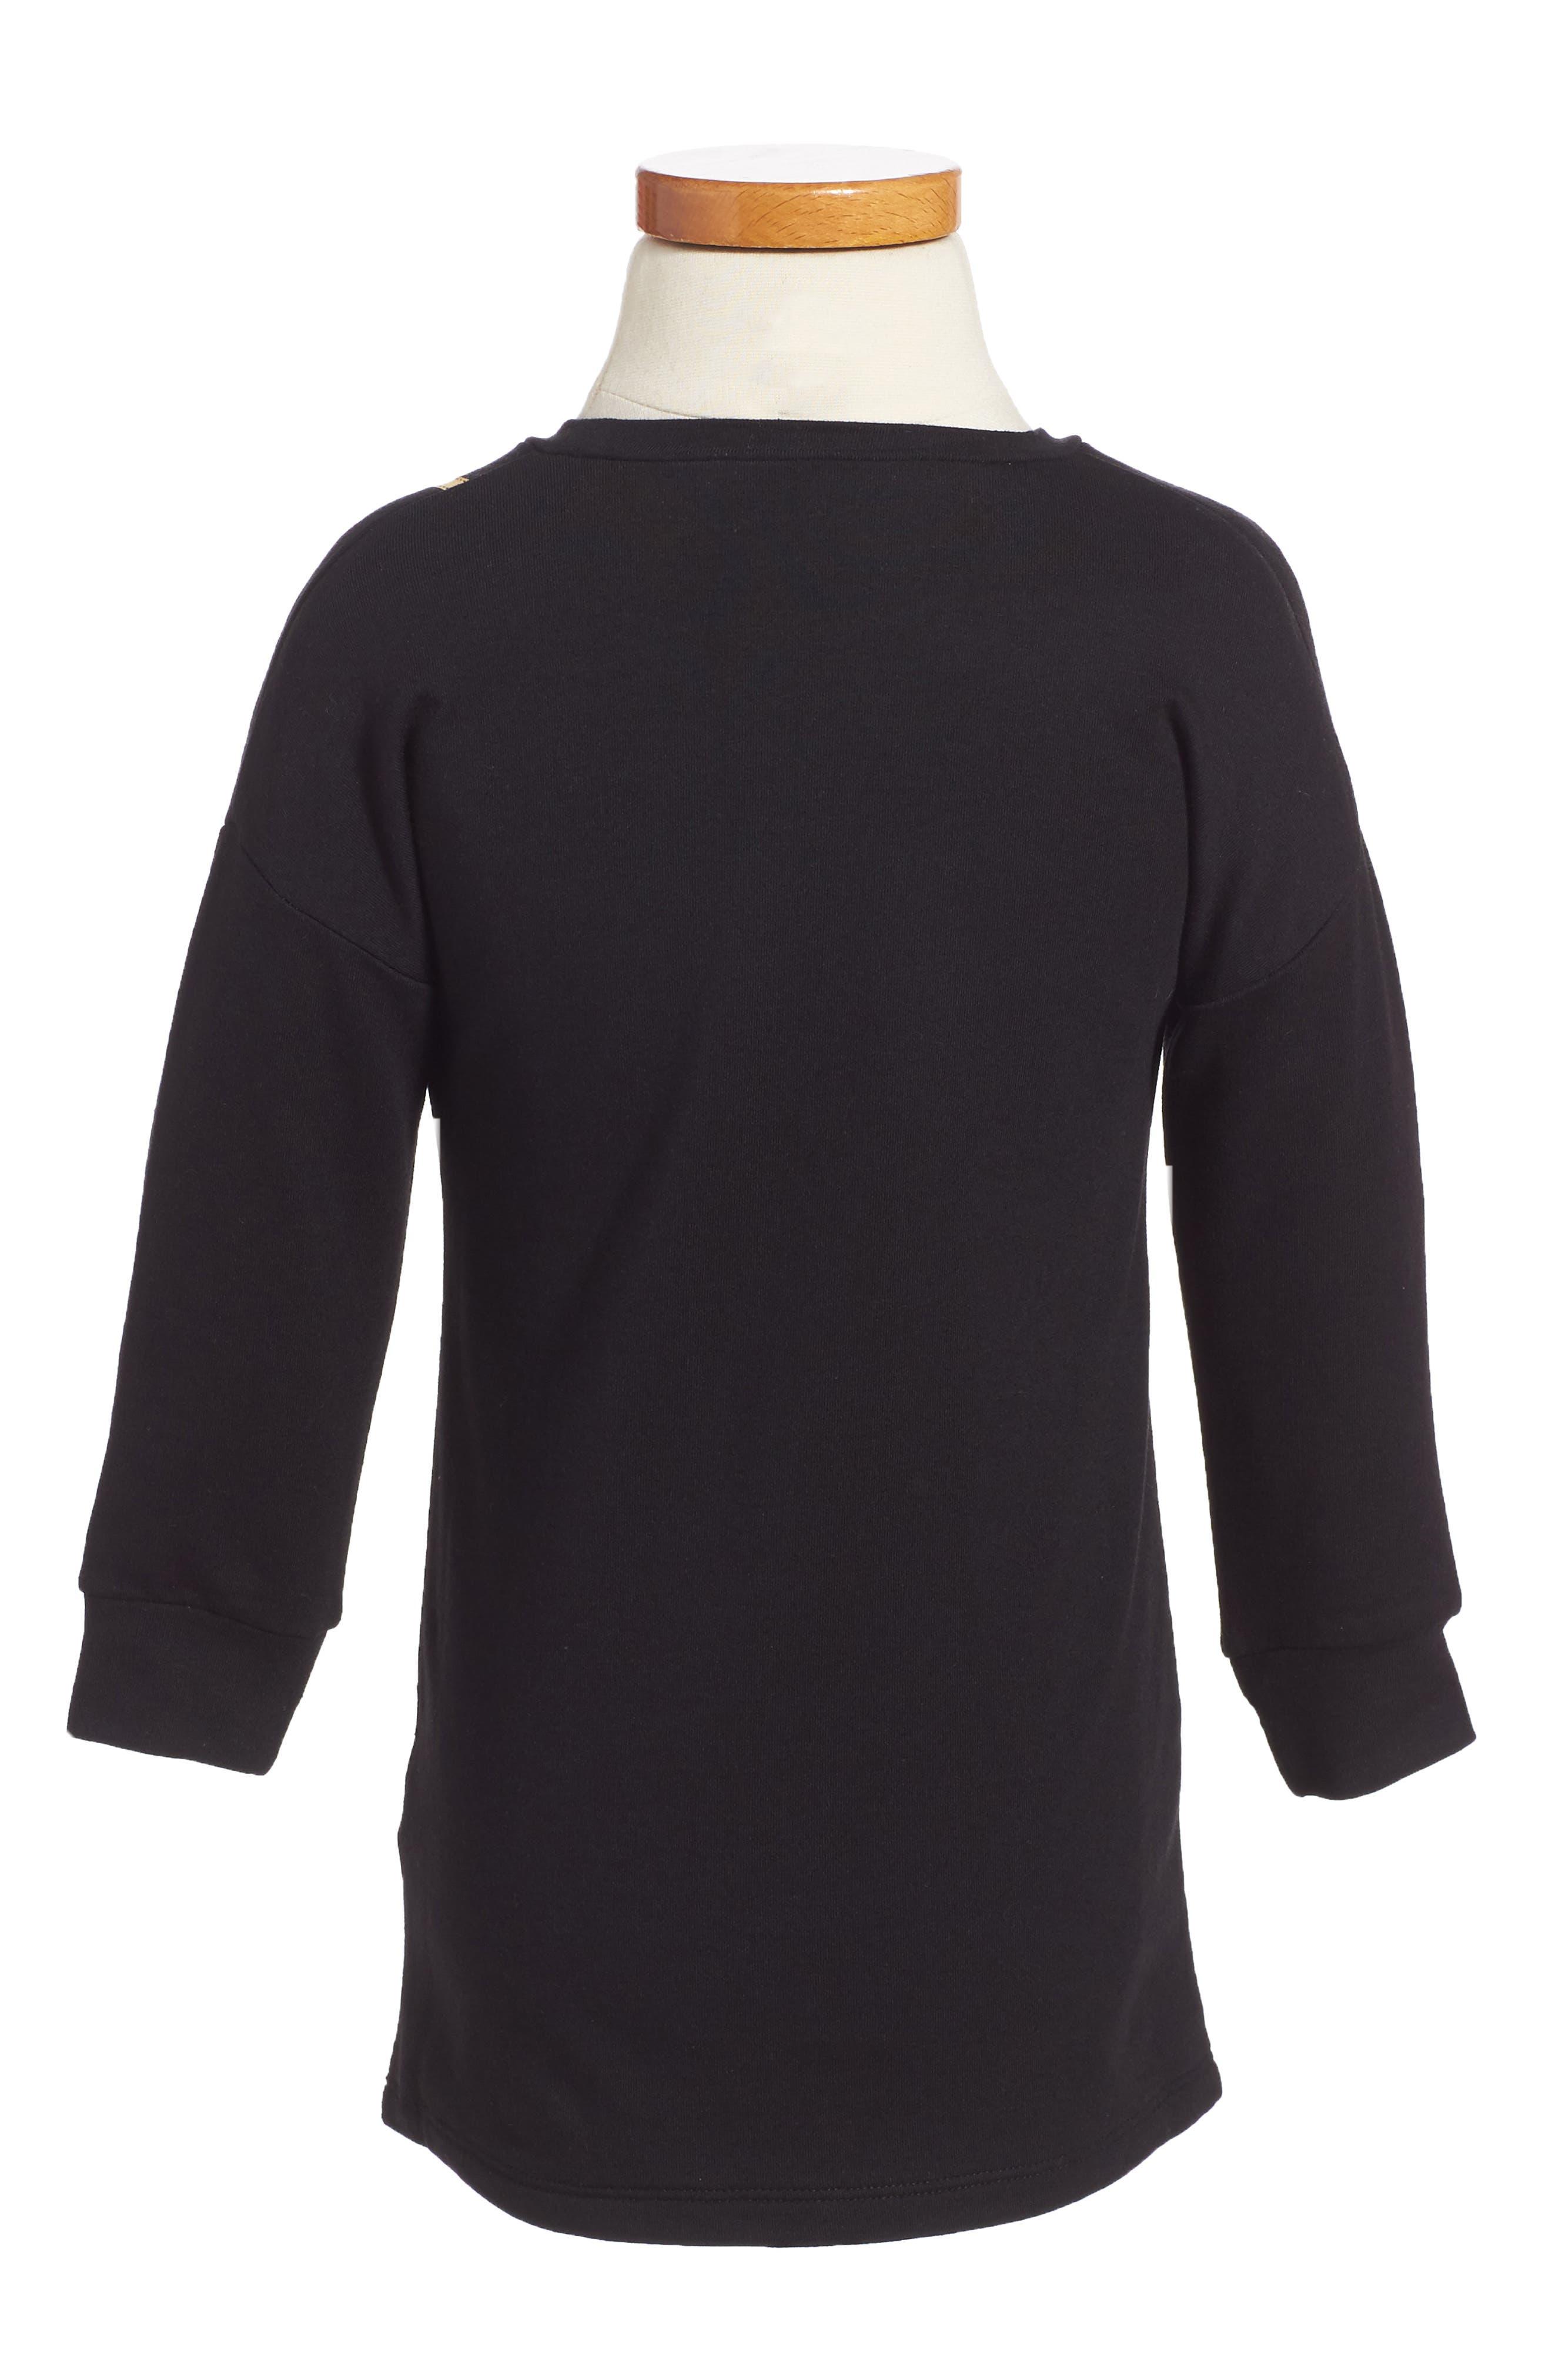 Trompe L'Oeil Sweatshirt Dress,                             Alternate thumbnail 2, color,                             009